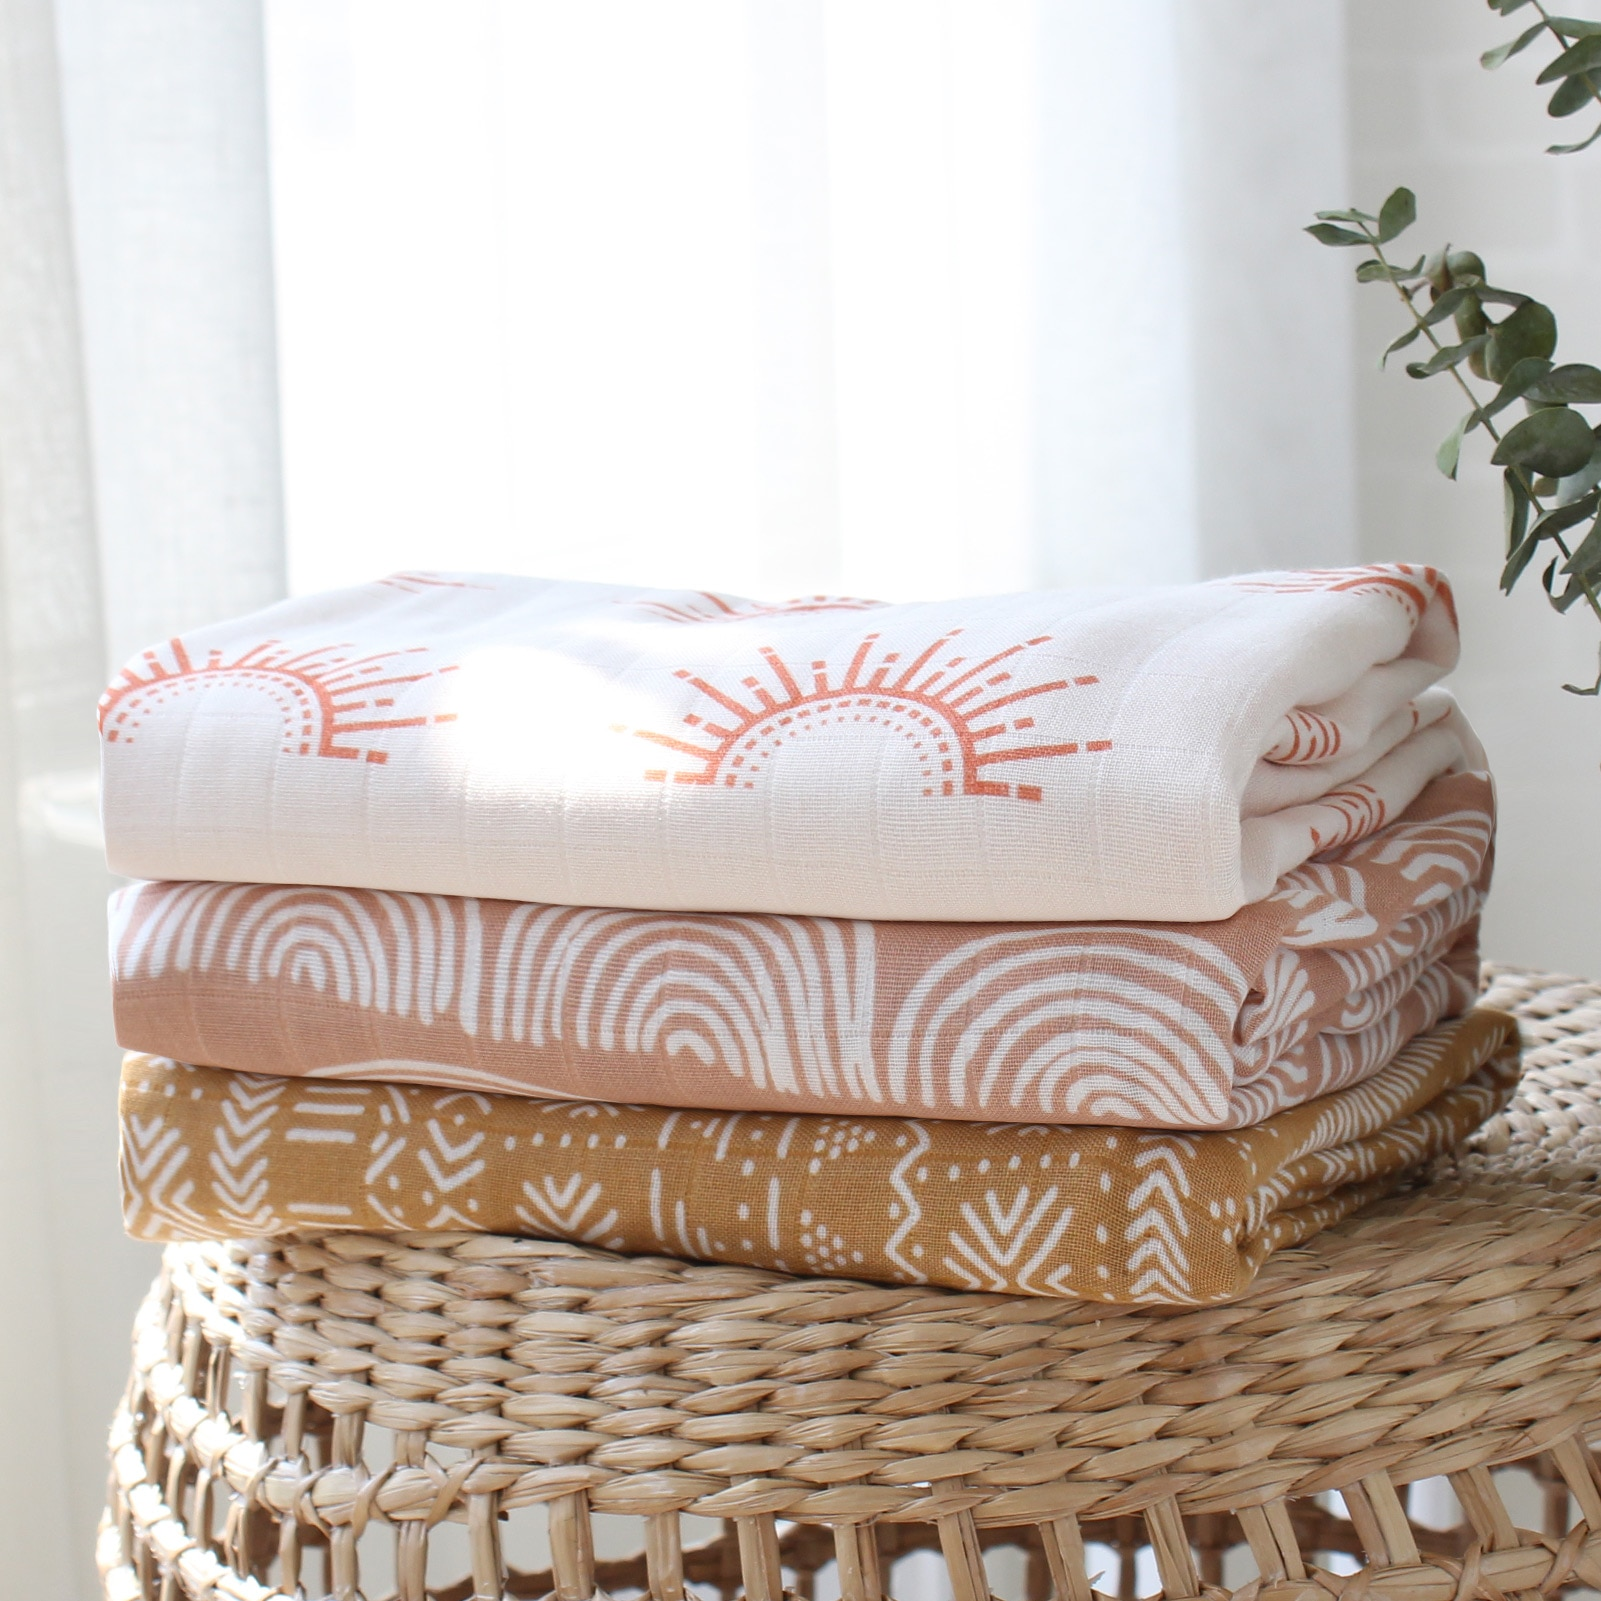 Bamboo Cotton Soft Baby Blankets Newborn Muslin Swaddle Blanket for Newborn Girl and Boy Baby Bath Towel